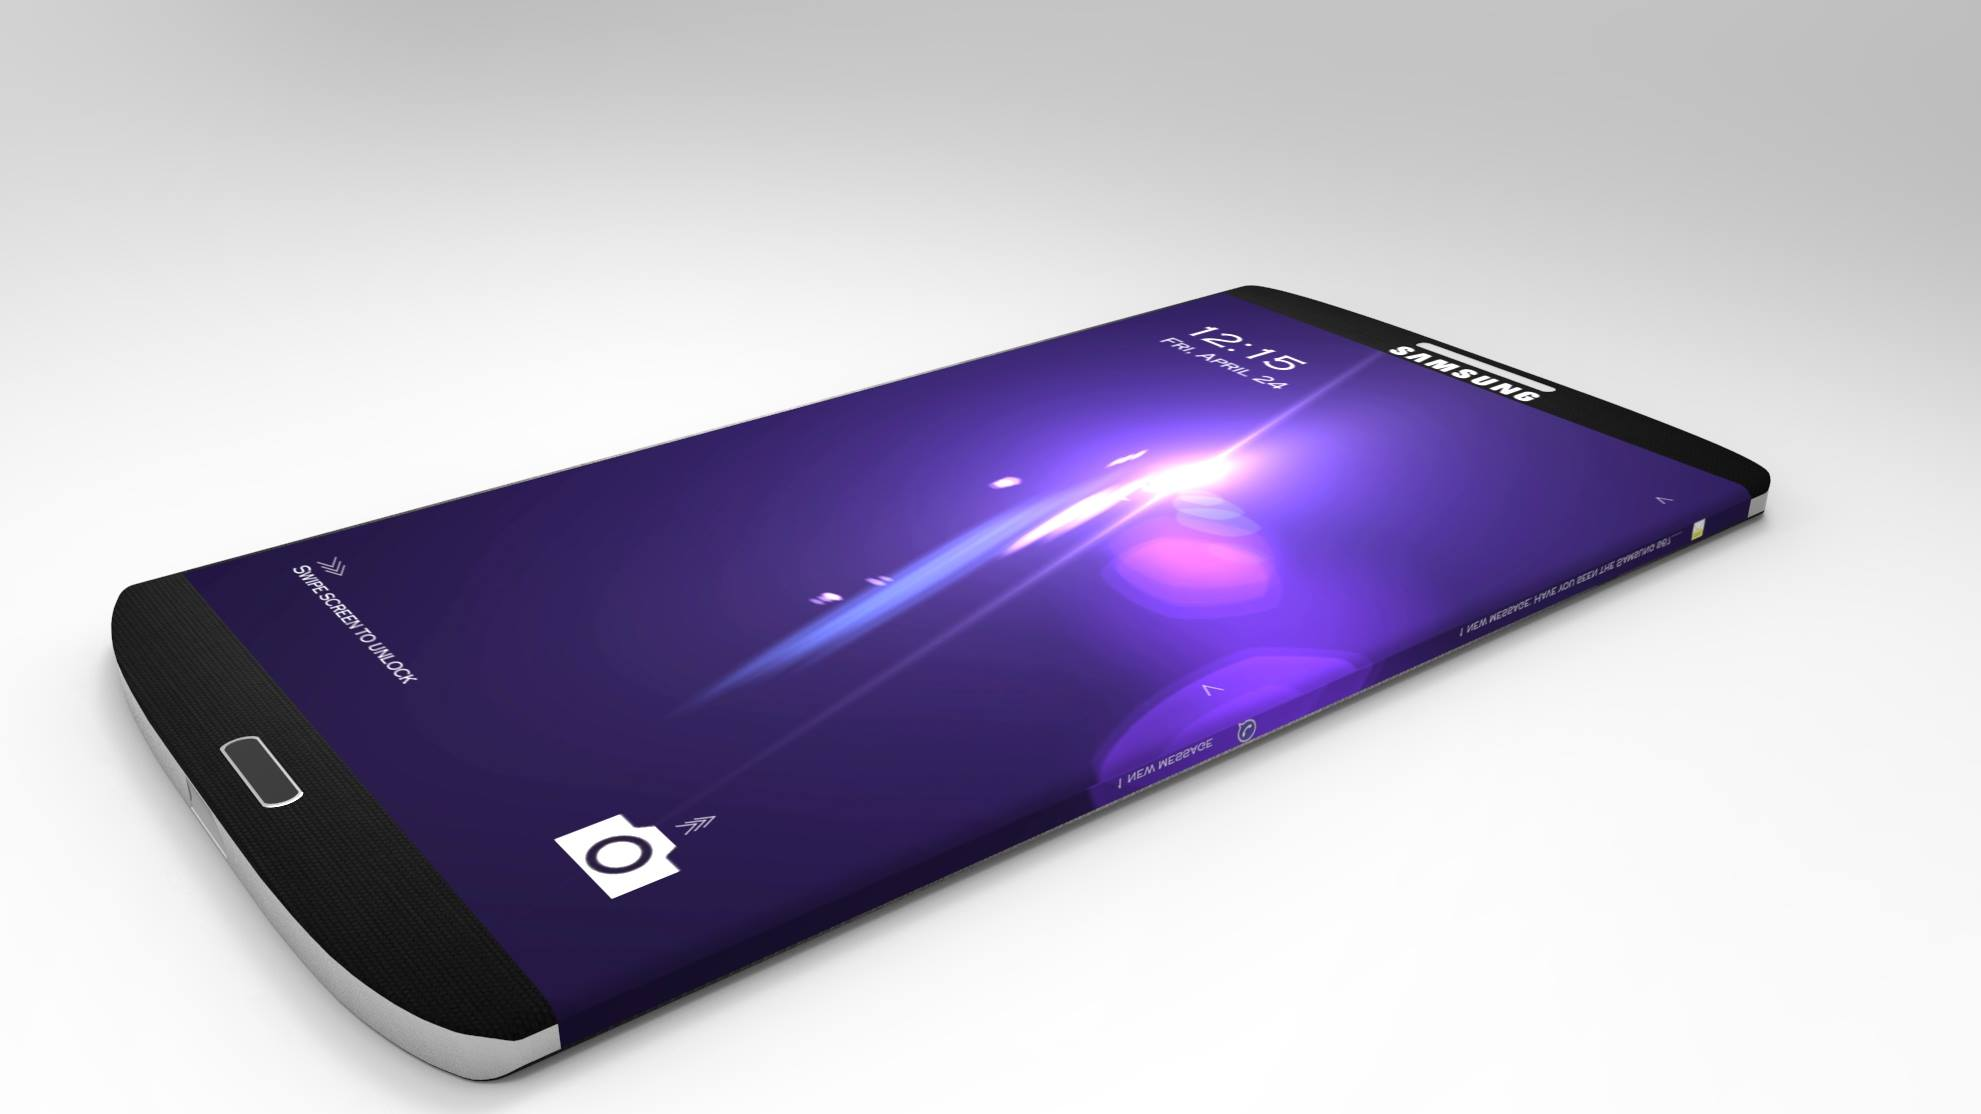 samsung galaxy s6 le premier smartphone dual edge. Black Bedroom Furniture Sets. Home Design Ideas